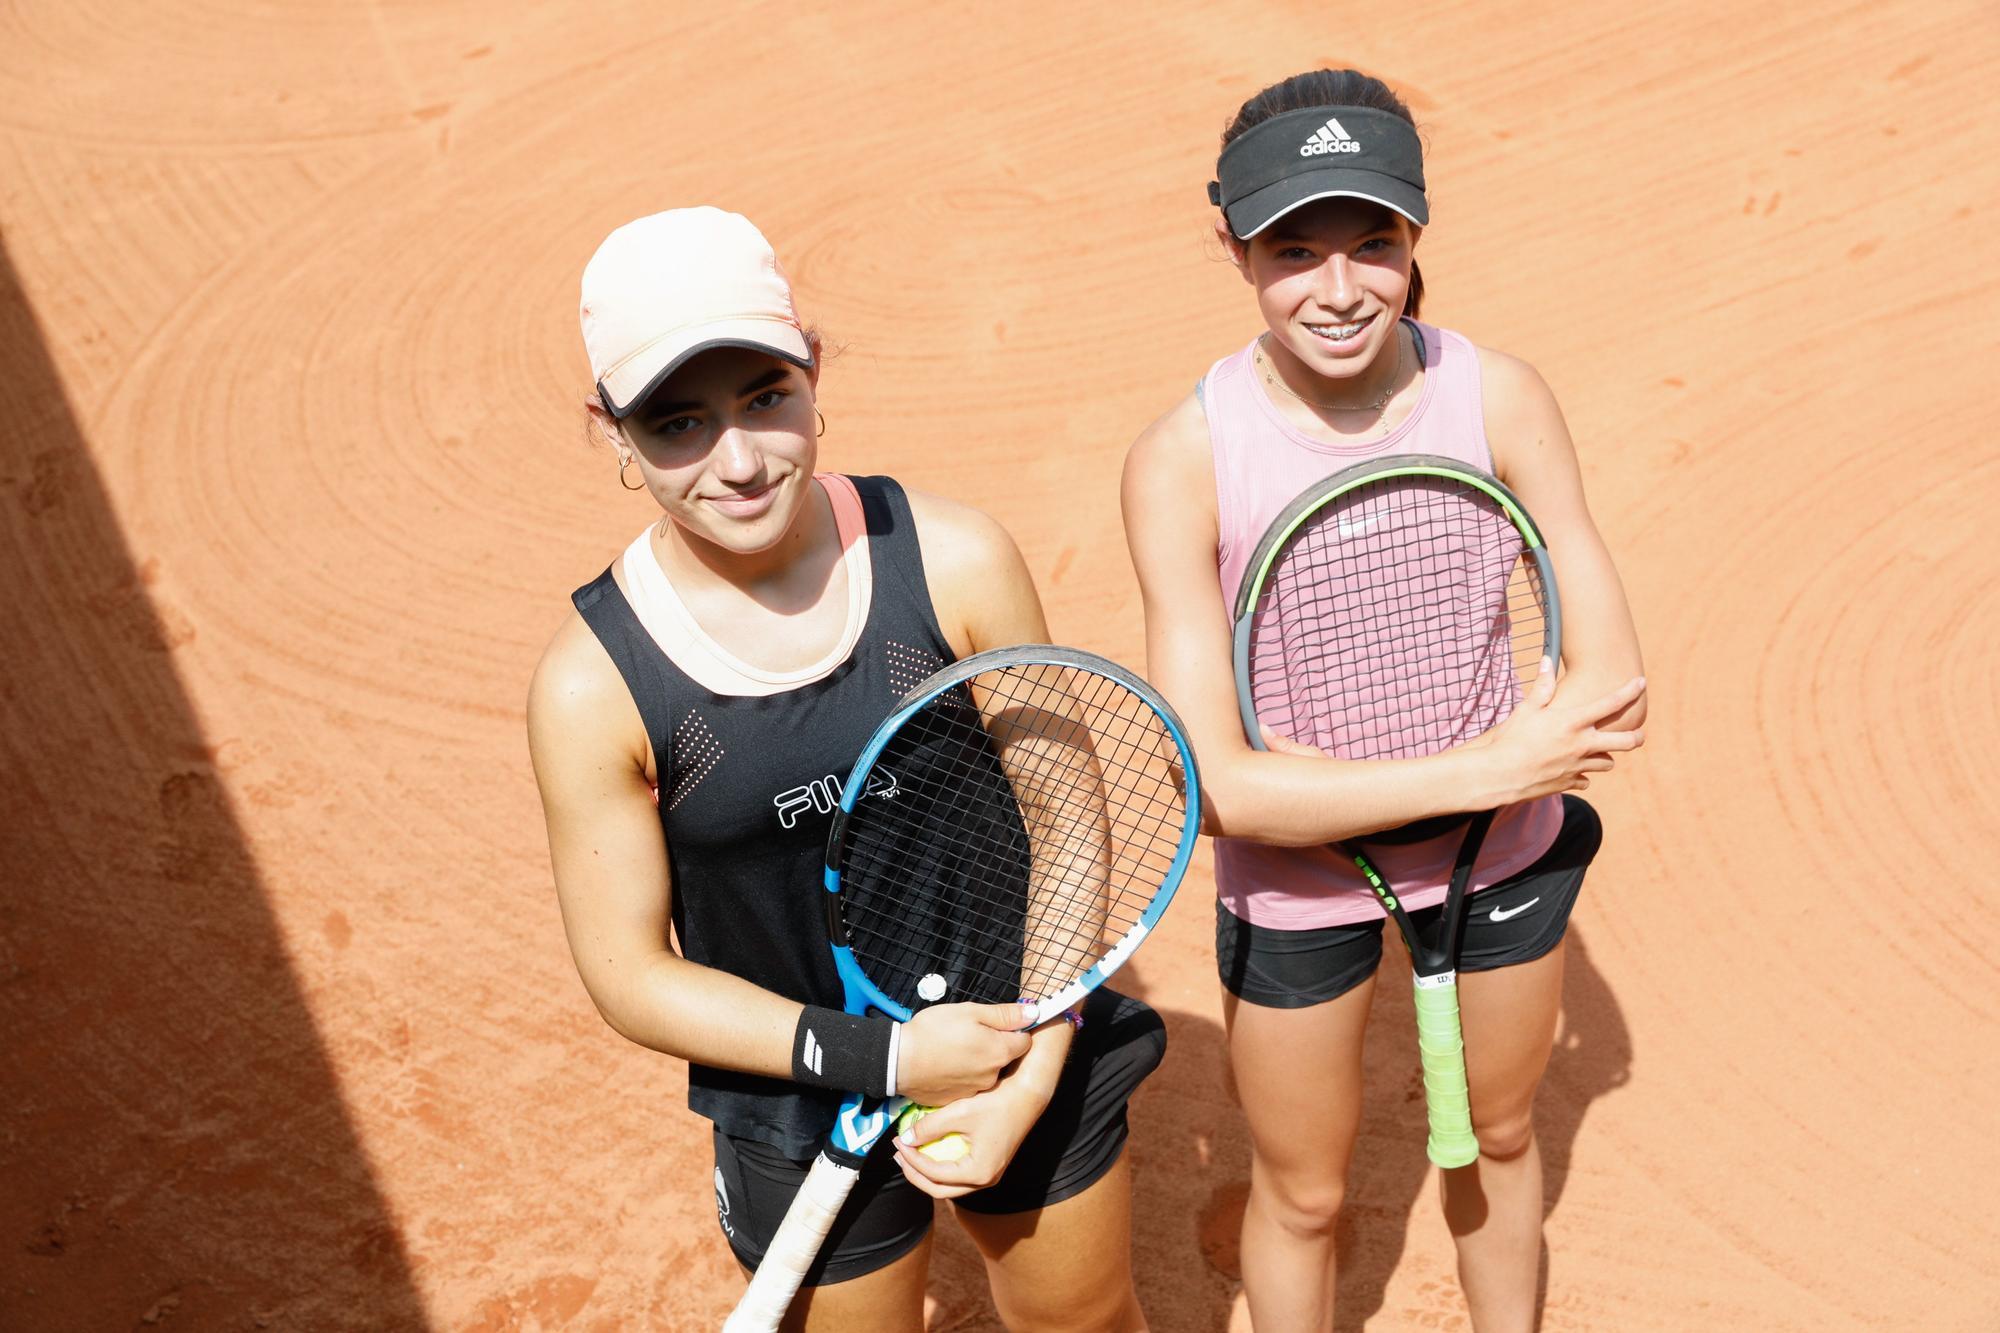 El día después de la victoria de Carreño en el Club de Tenis de Avilés: